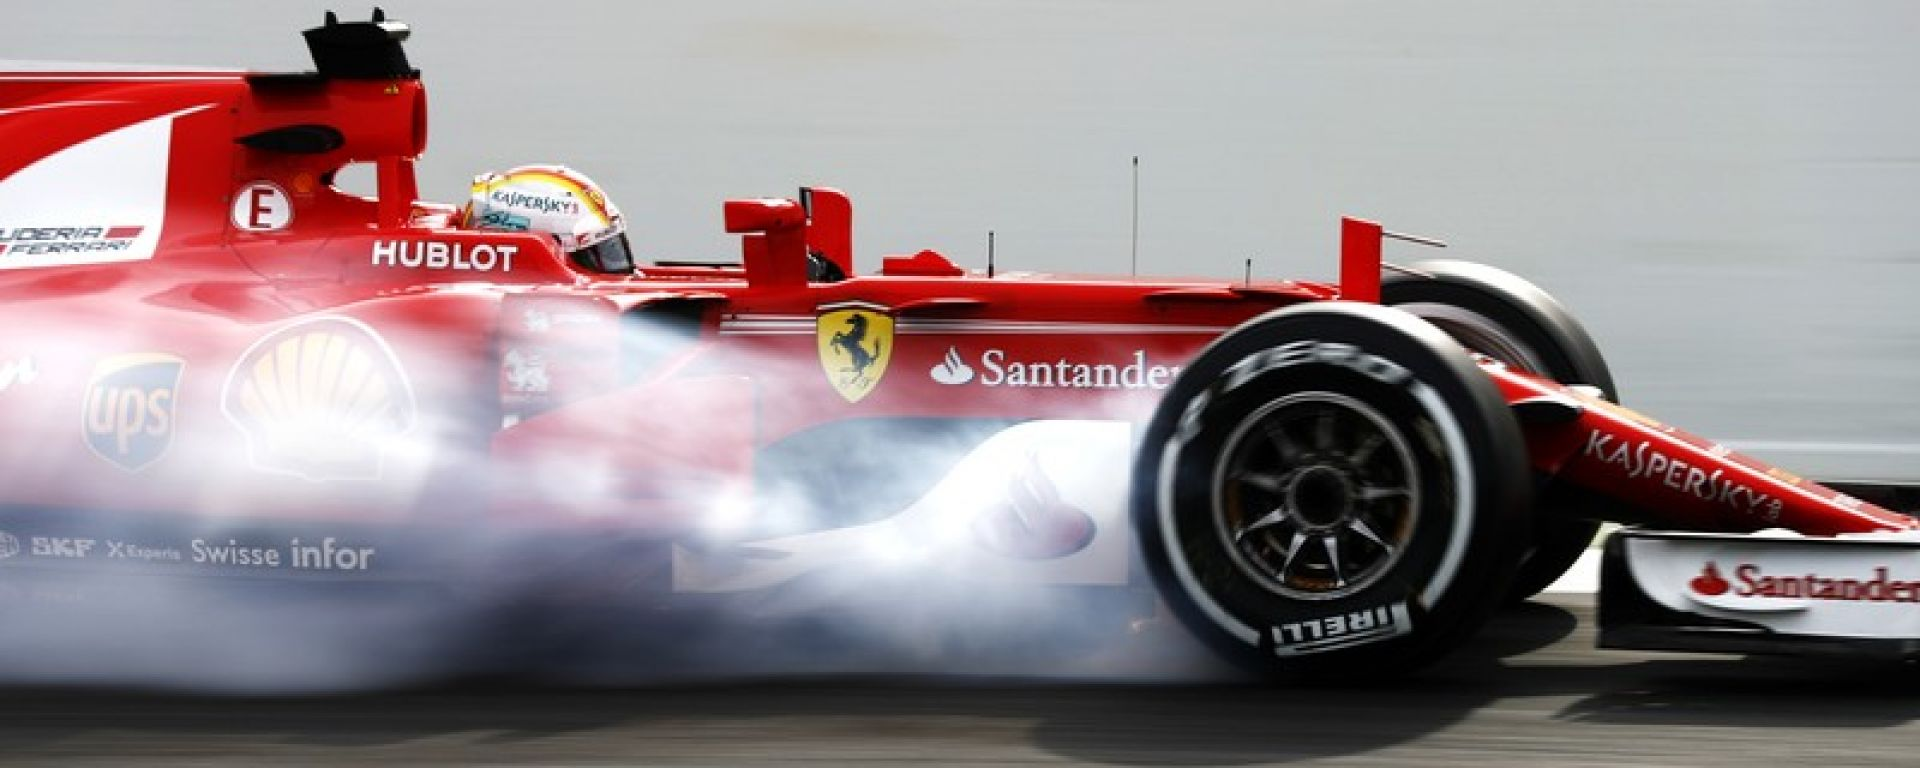 Ferrari SF70H Brembo lock-up